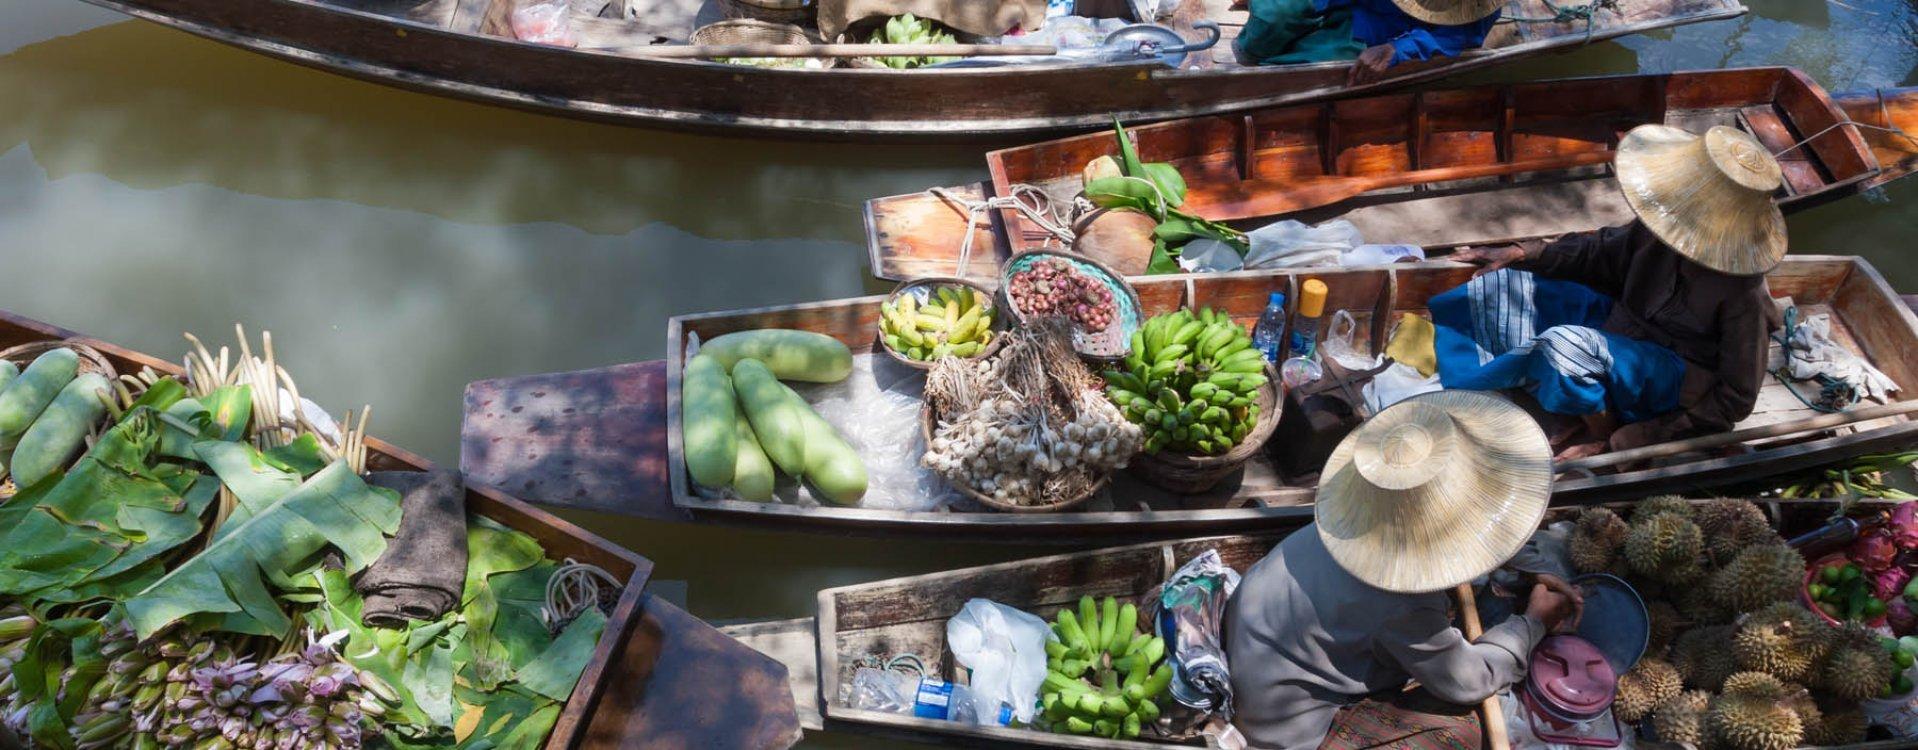 Floating Market Damnoen Saduak